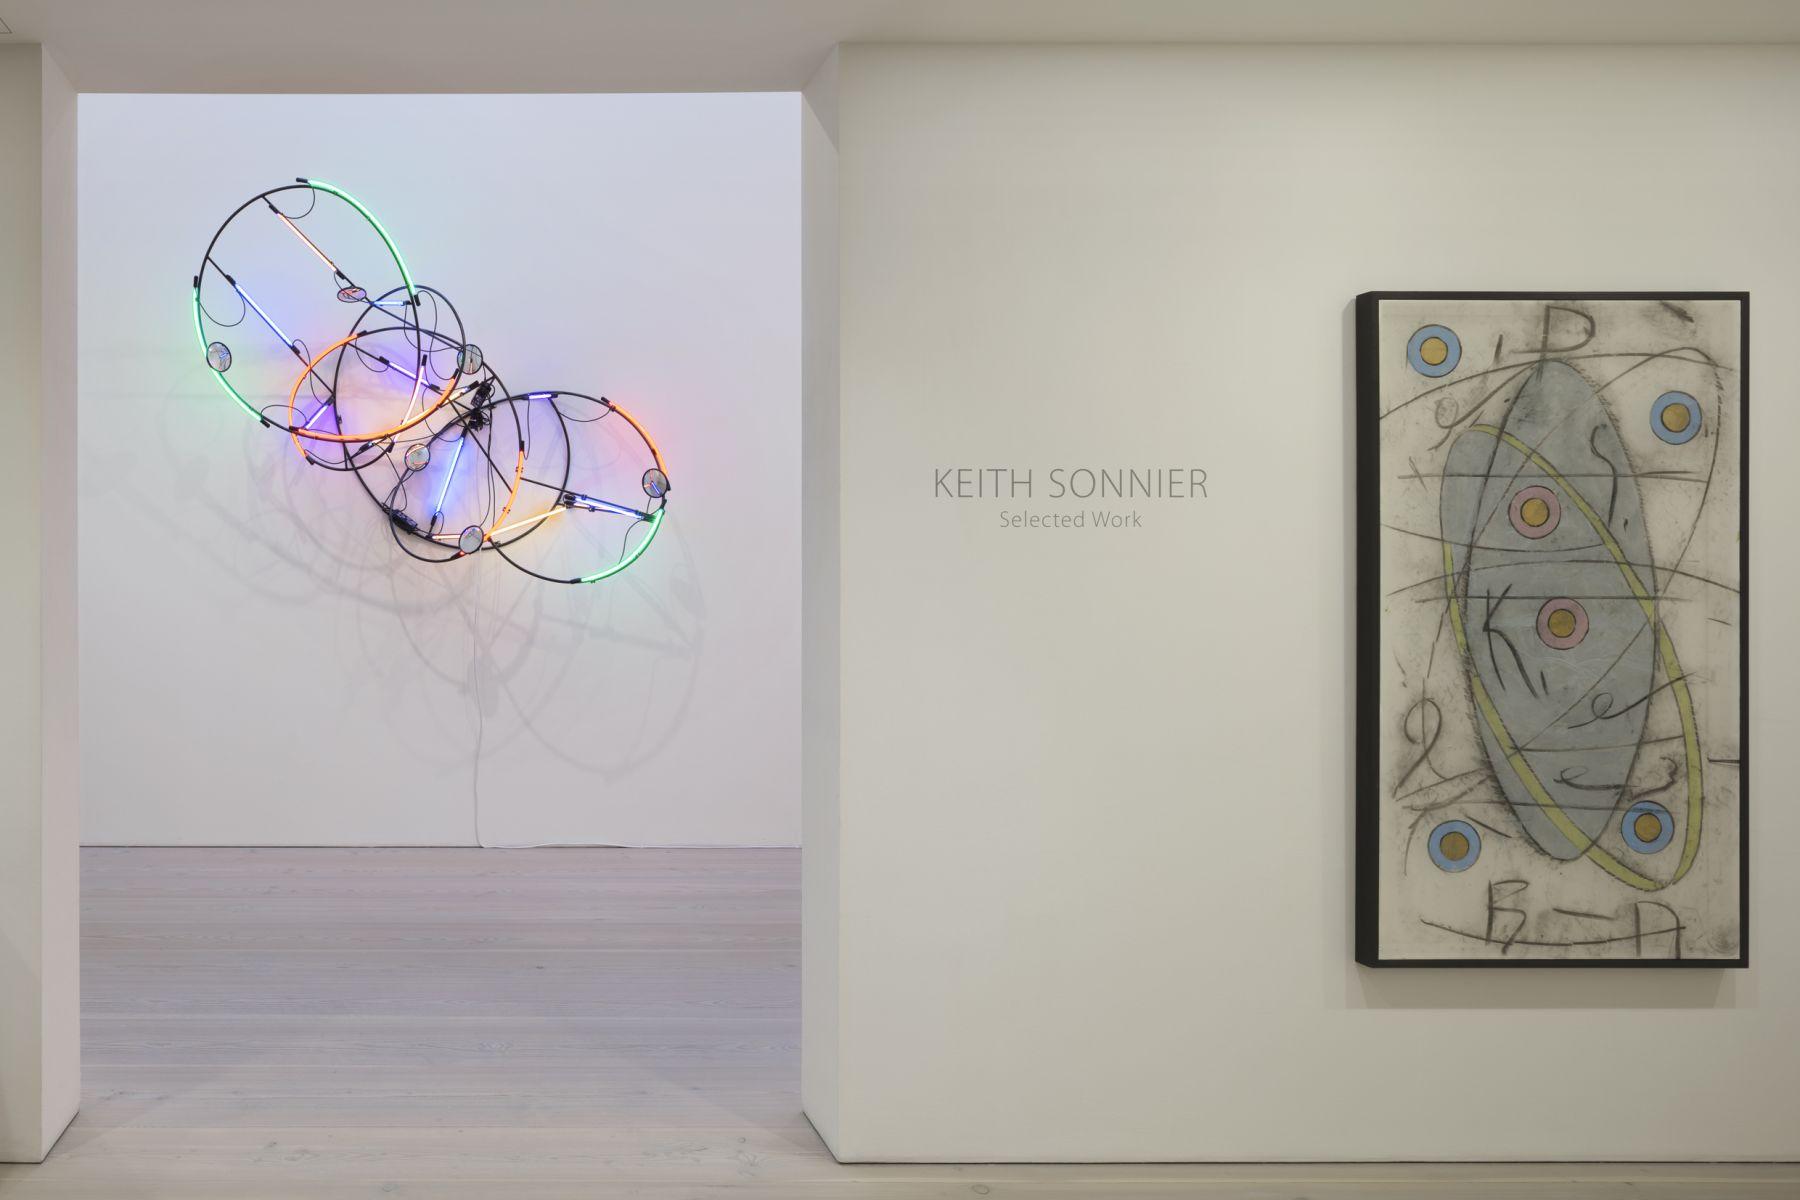 Keith Sonnier